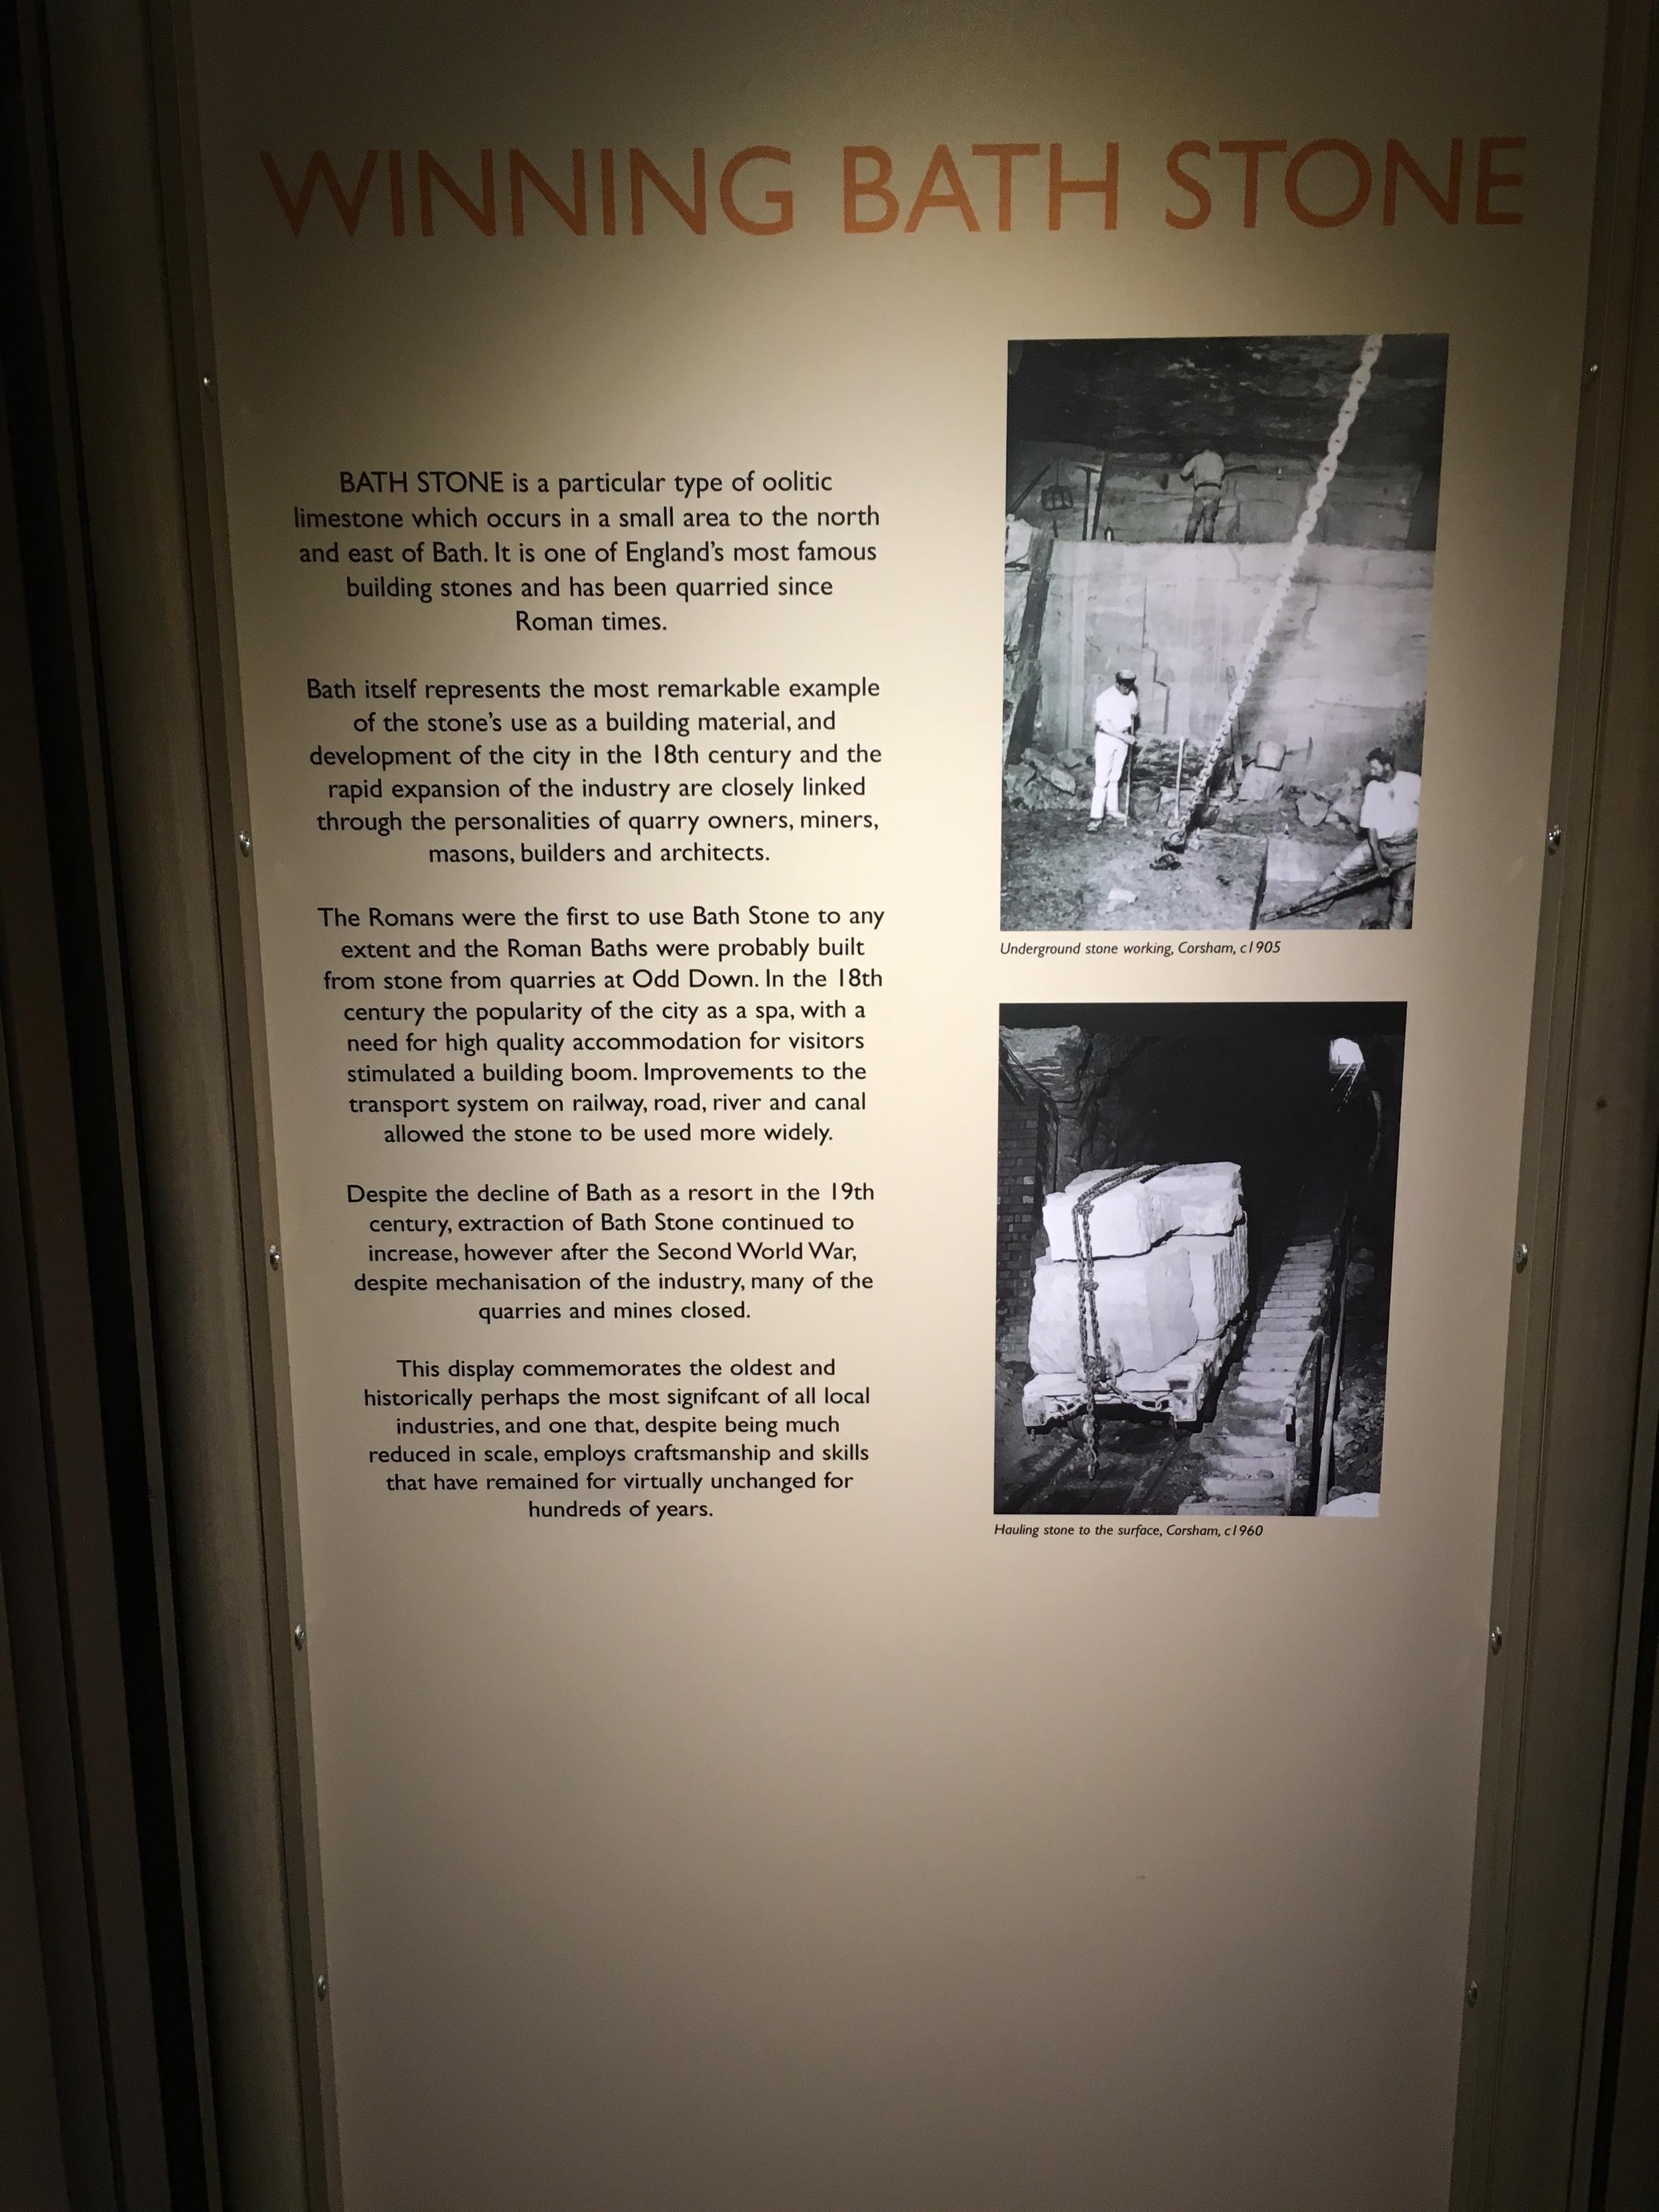 More information on winning Bath limestone.